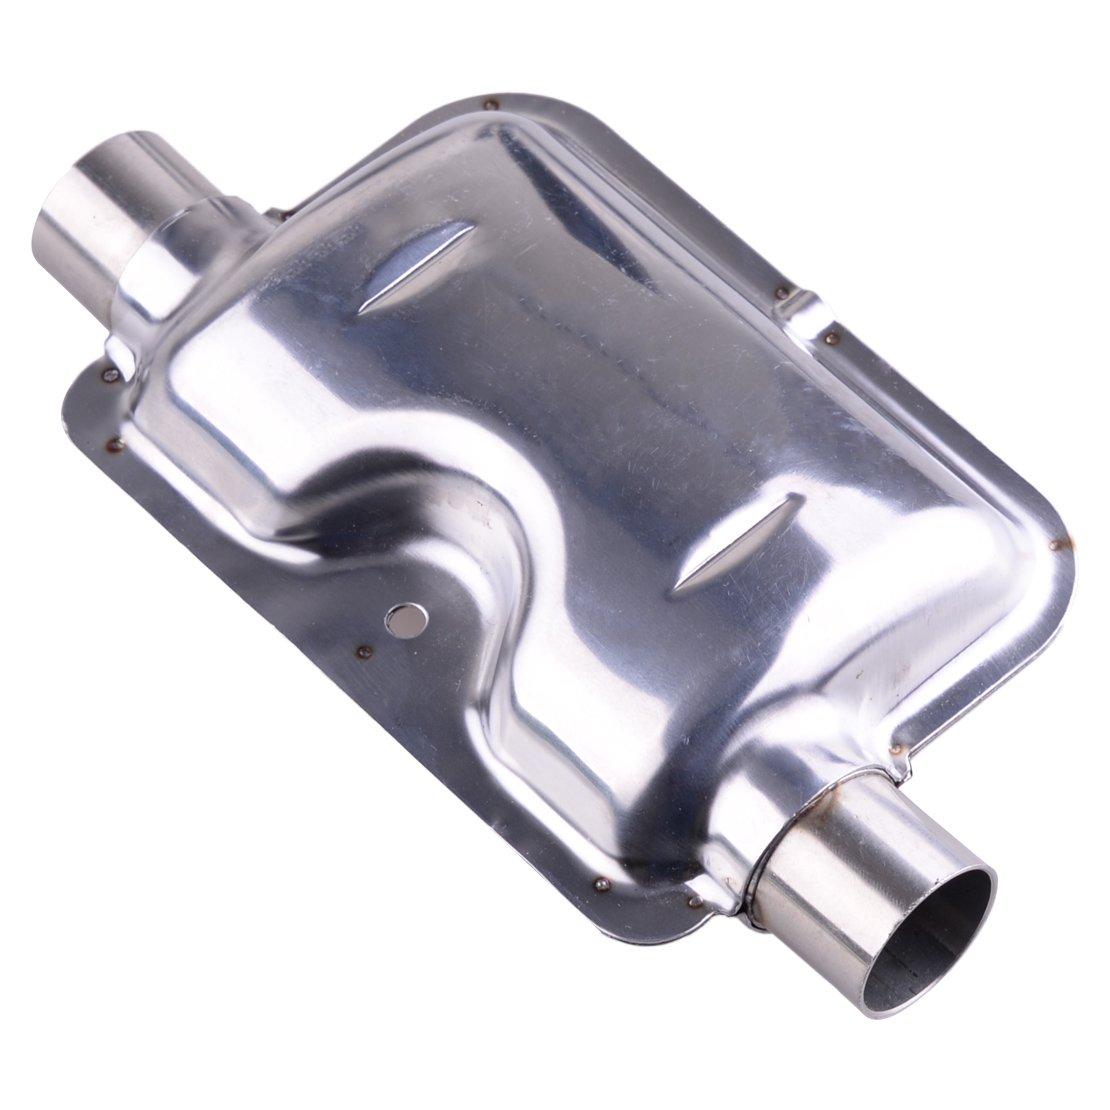 beler Silencieux diesel de silencieux d/échappement de chauffe-eau dacier inoxydable de 24mm 0.9inch